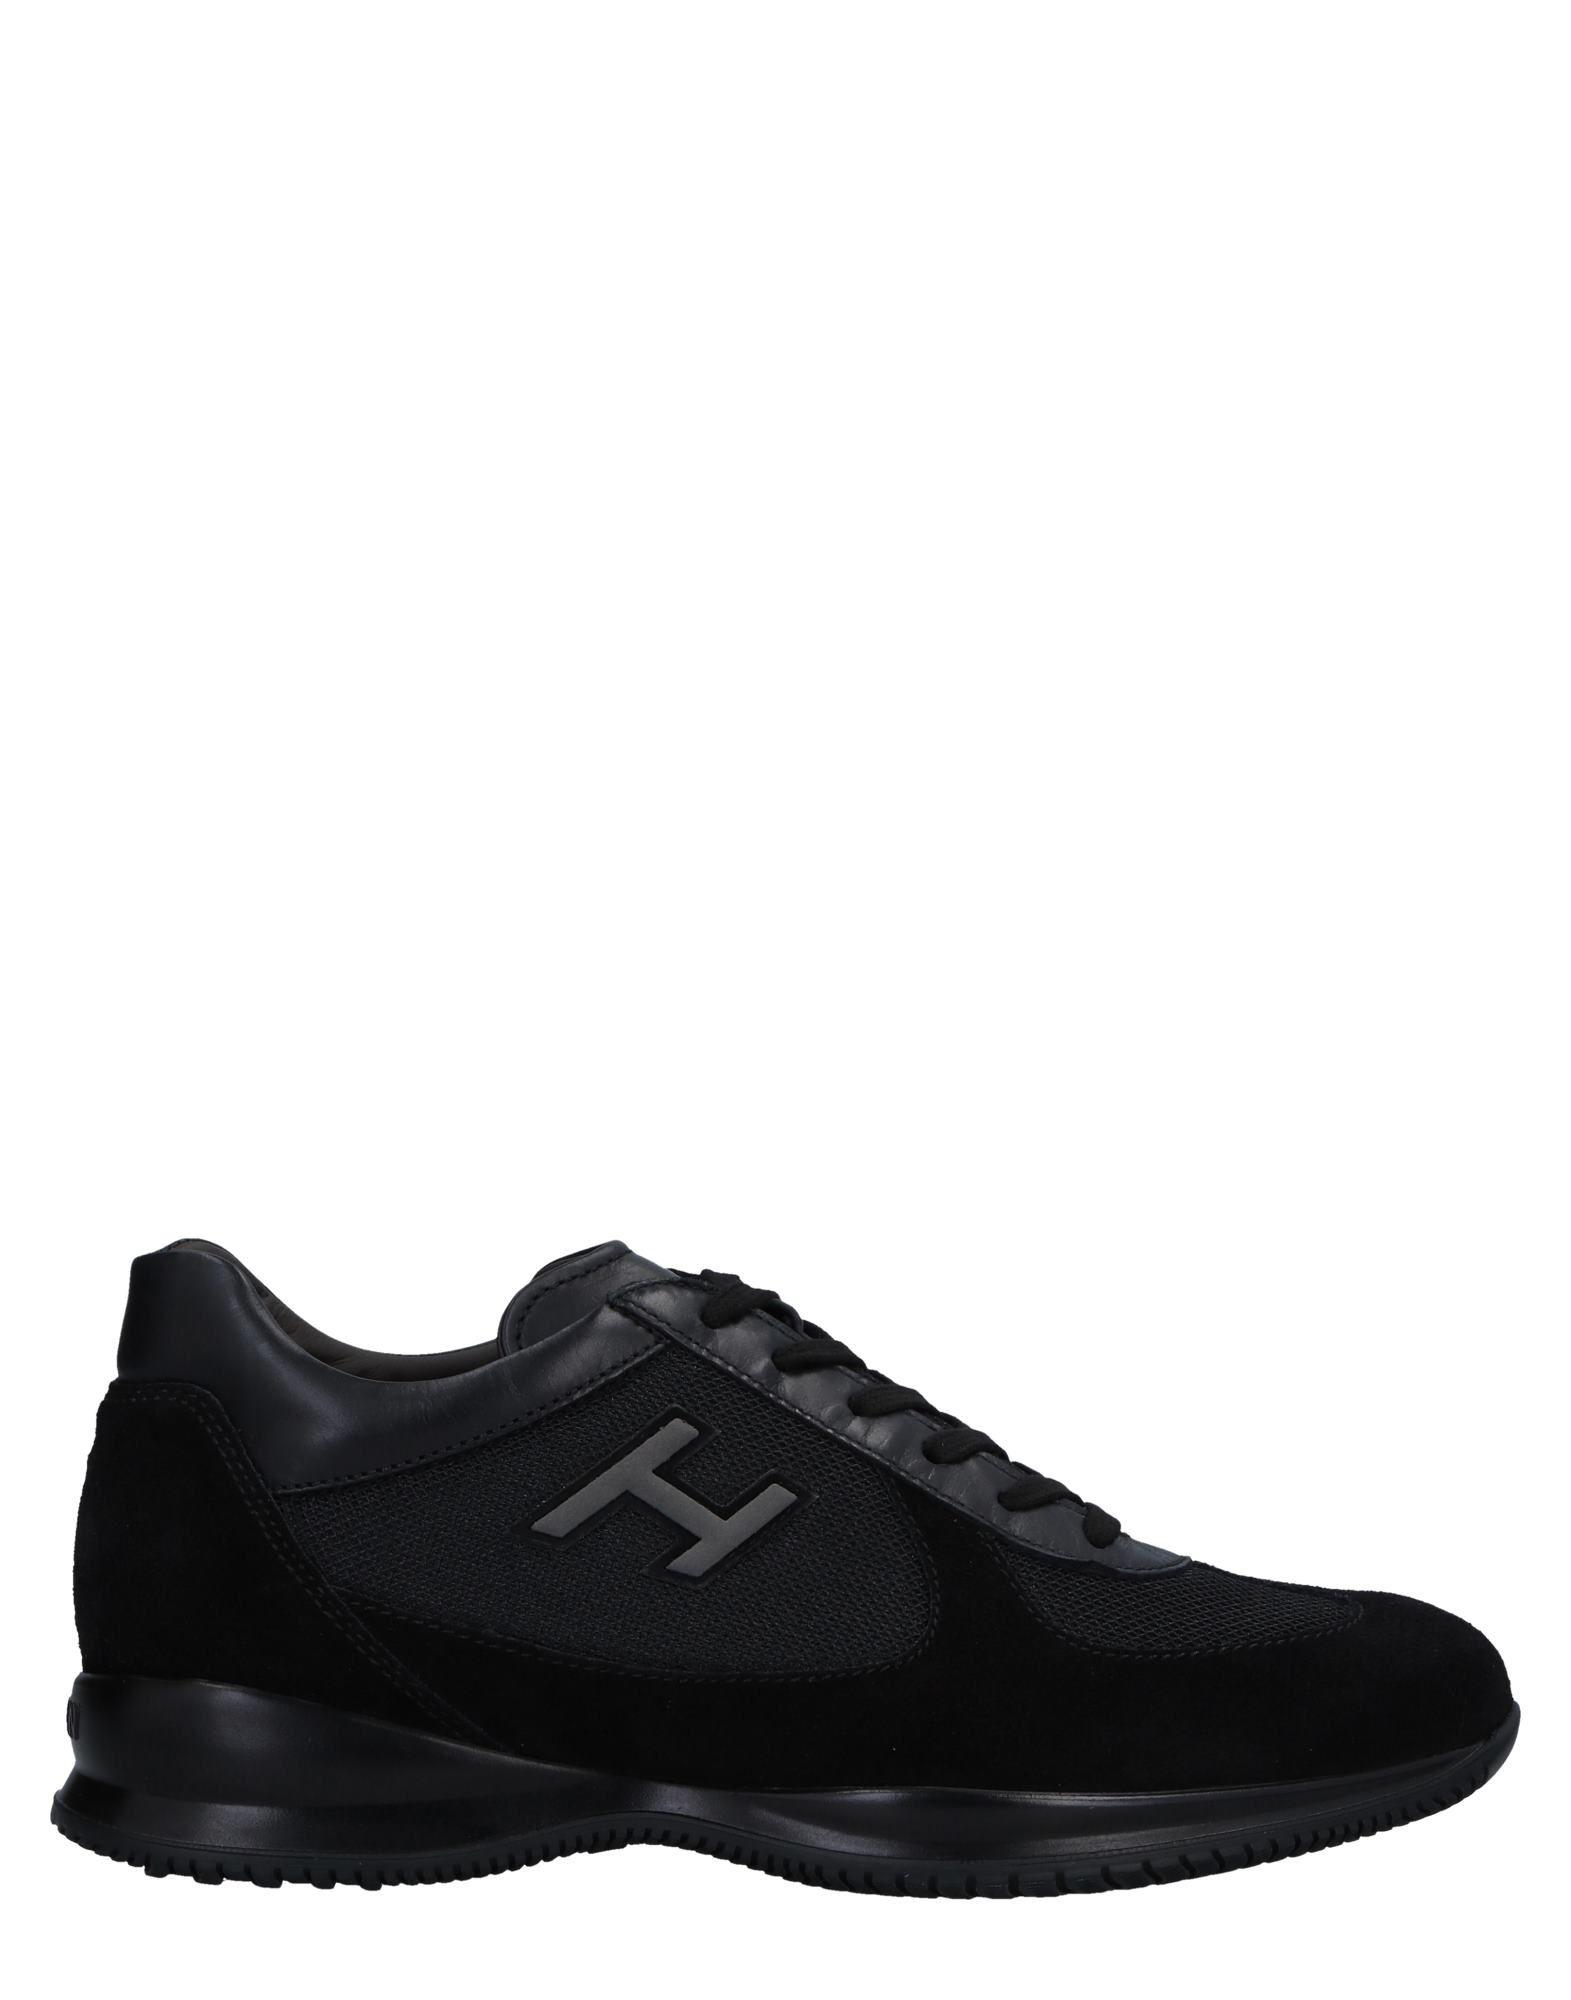 Moda Sneakers Hogan Uomo - 11516069LR